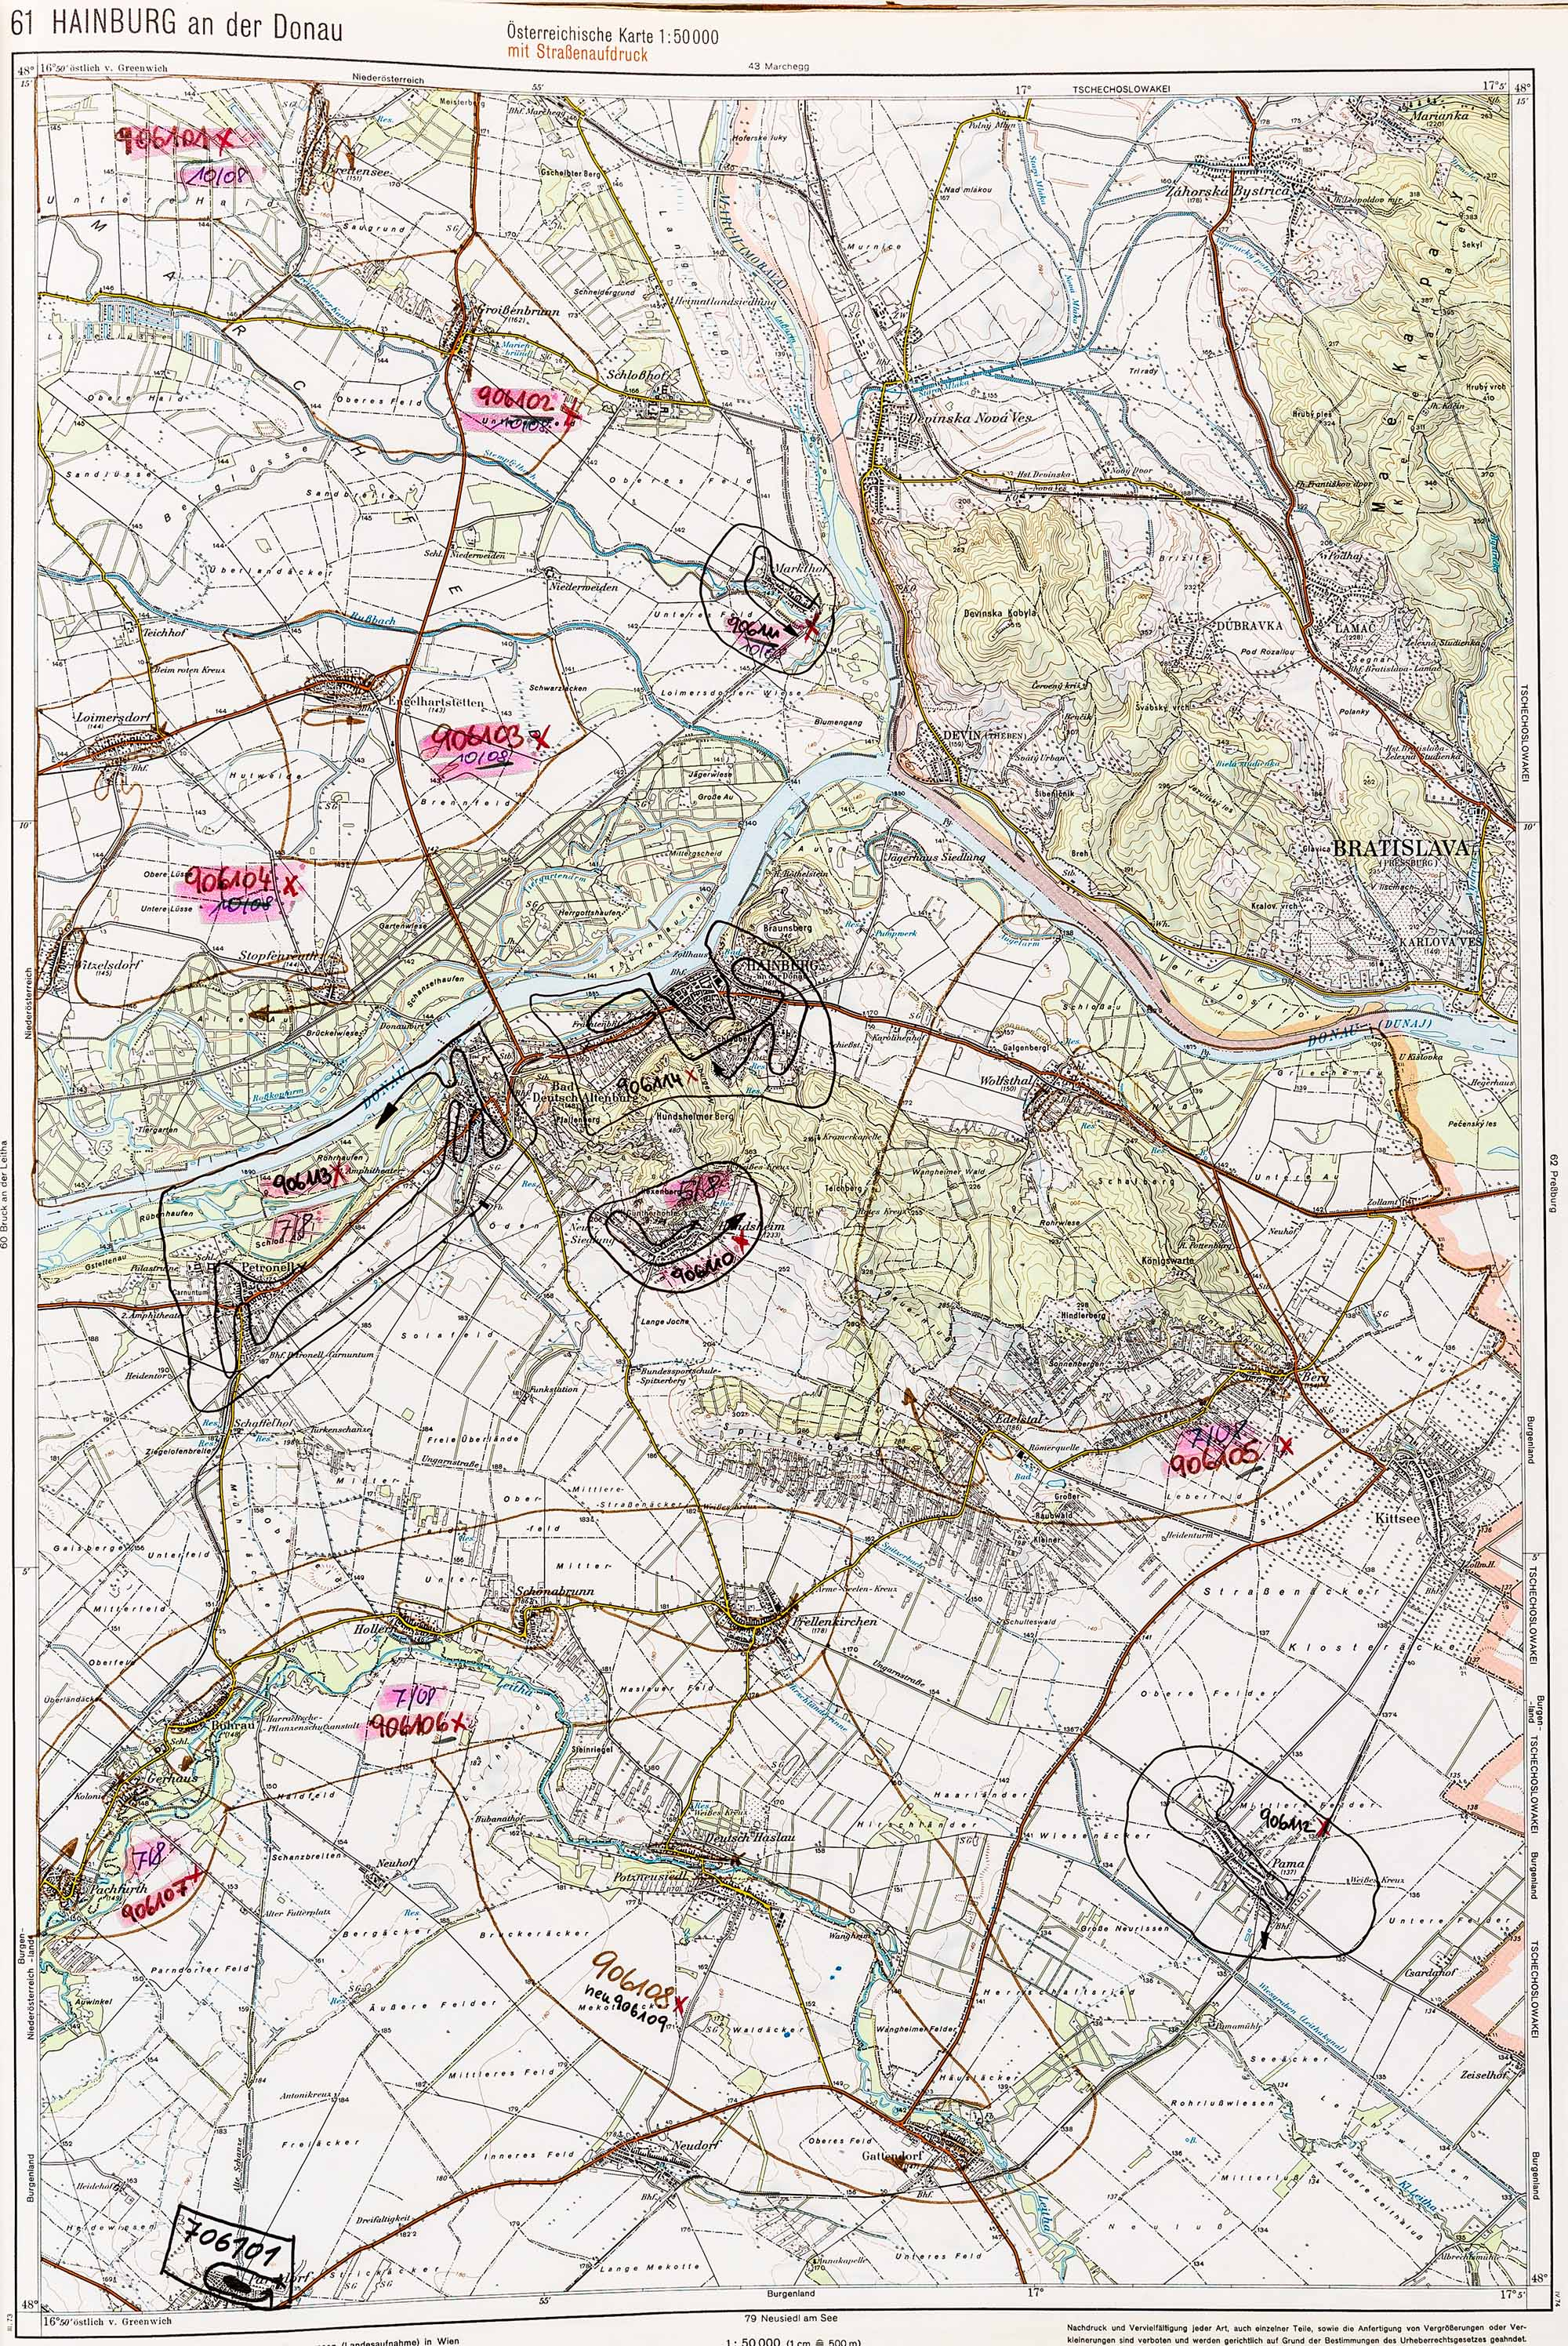 1975-1979 Karte 061